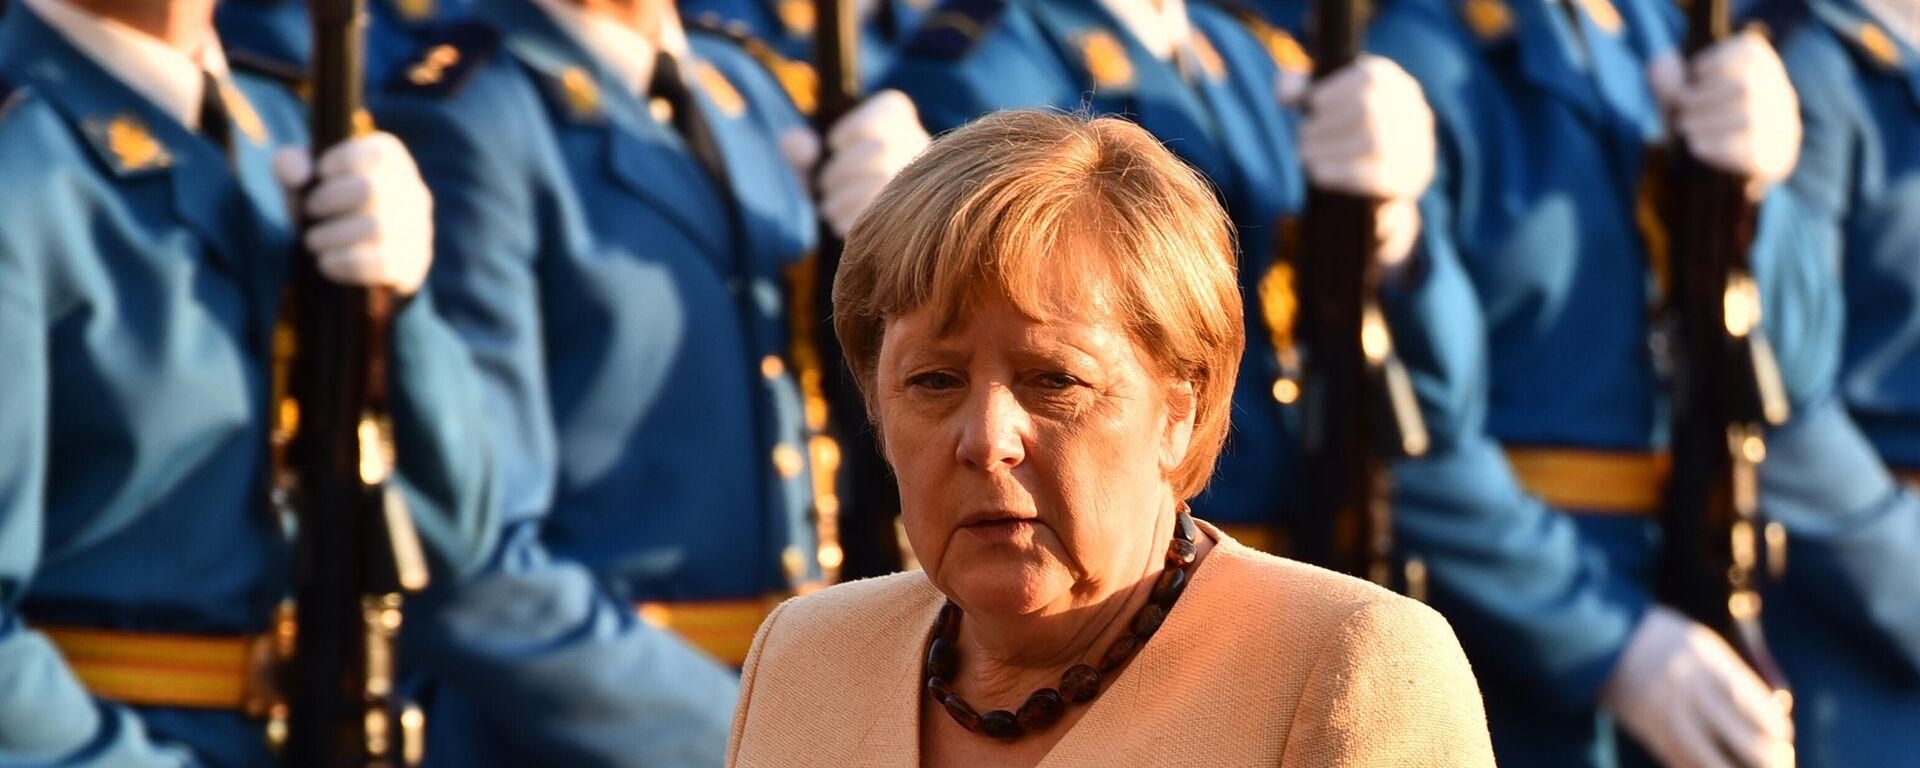 Angela Merkel u Beogradu - Sputnik Srbija, 1920, 26.09.2021